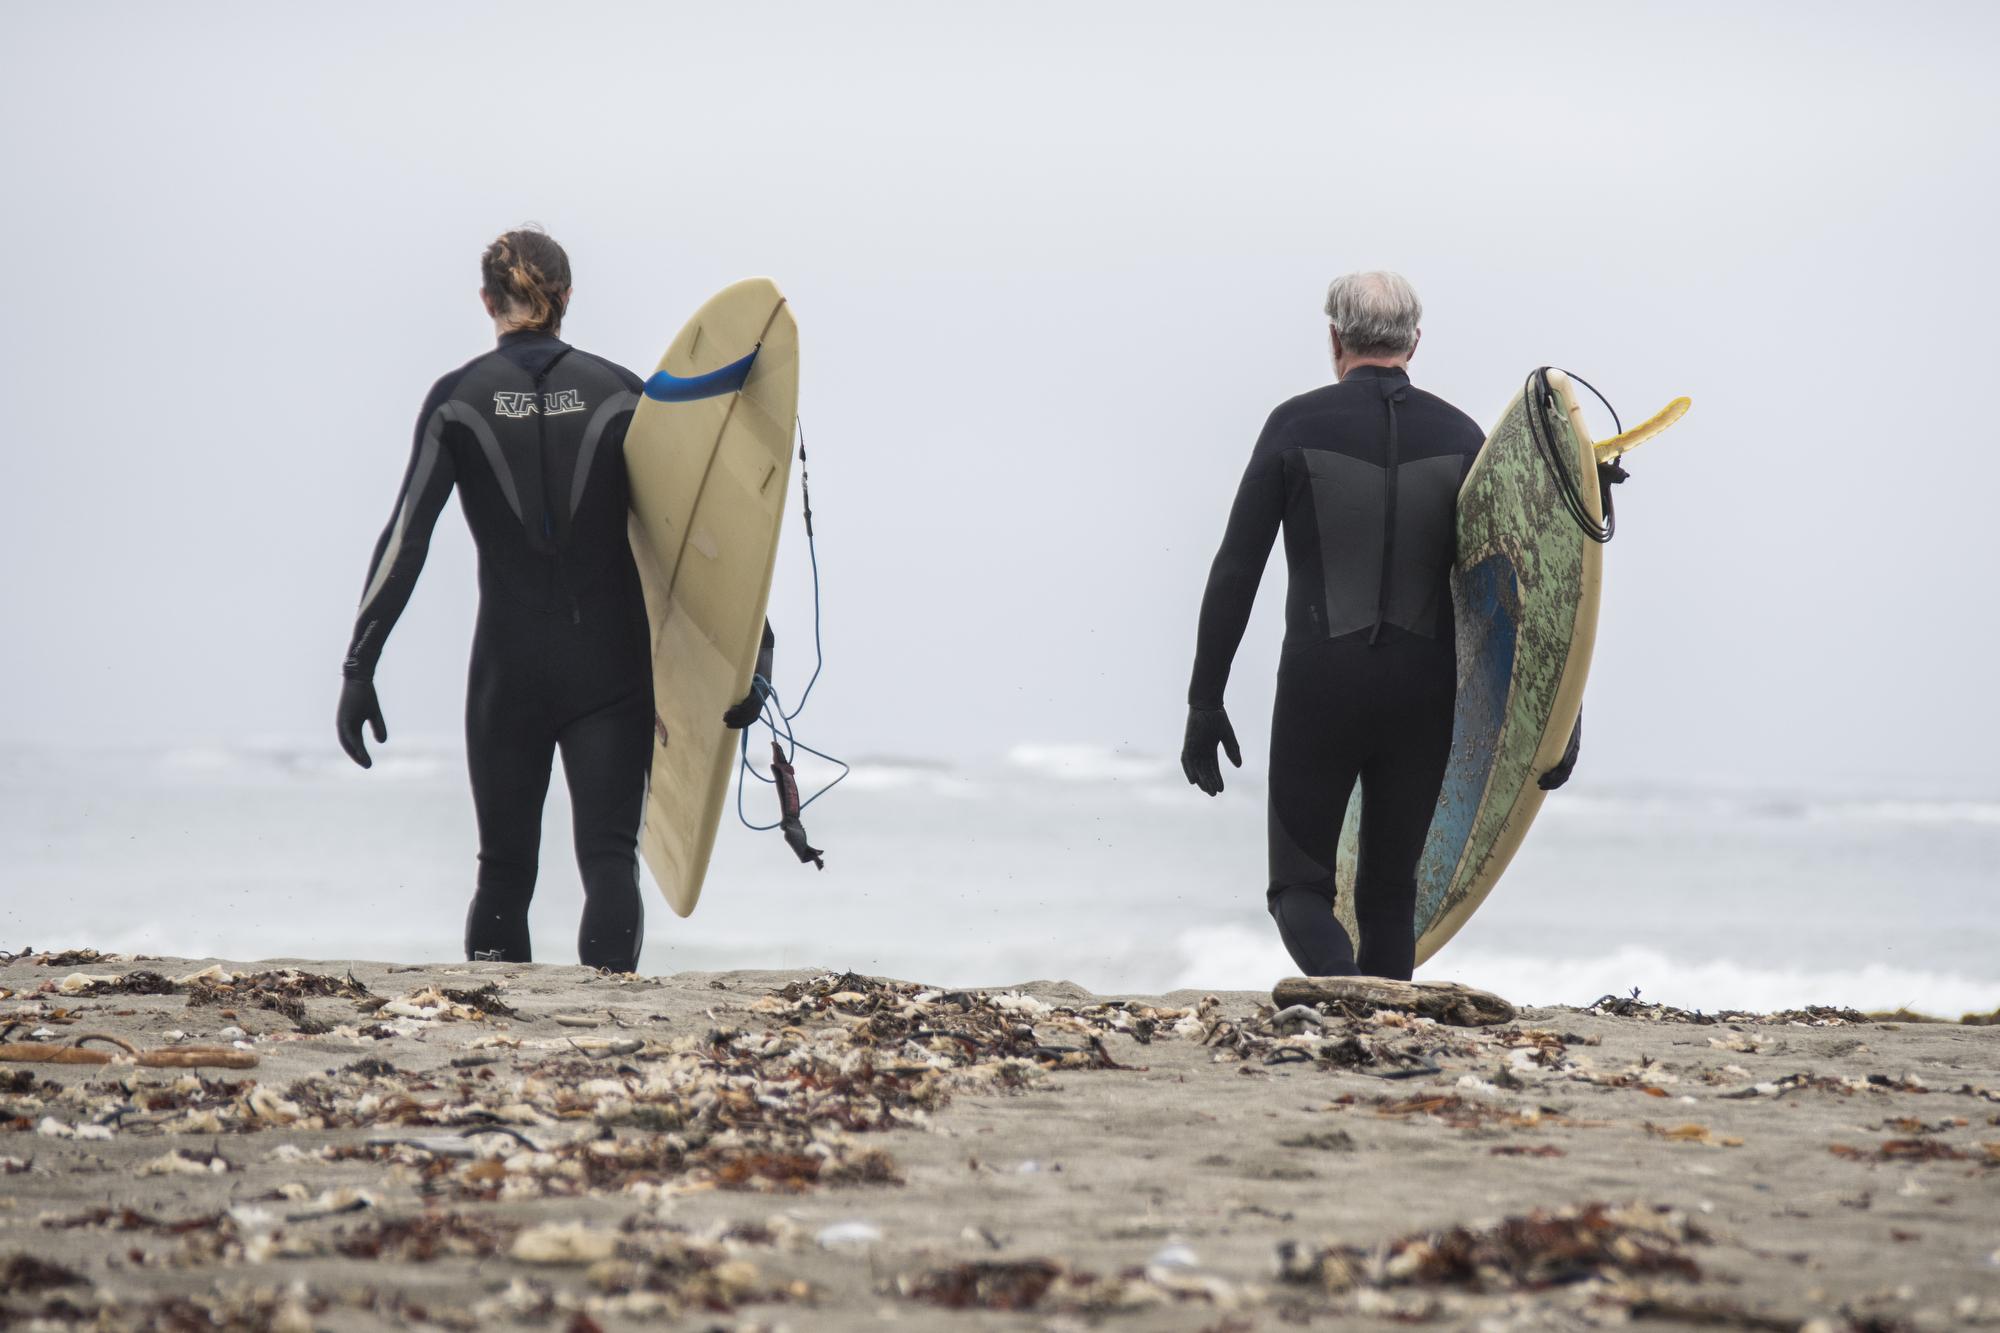 neah-bay-surf-trip-05